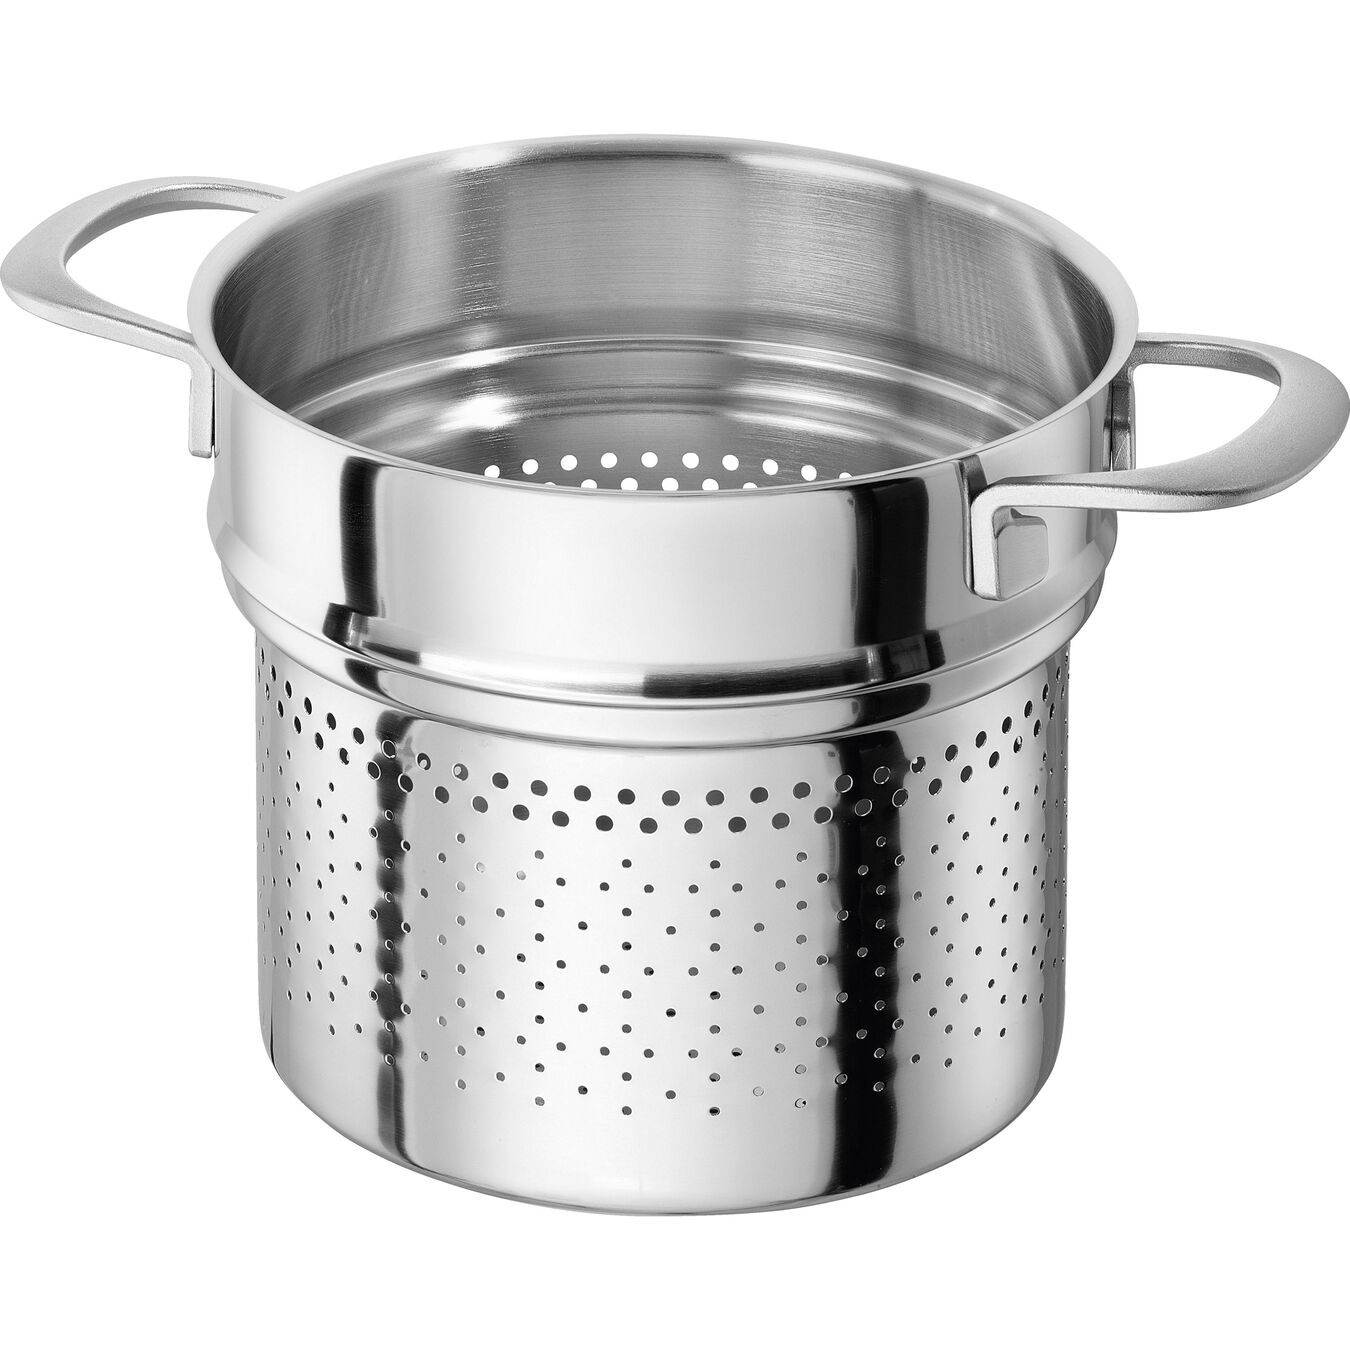 24 cm 18/10 Stainless Steel Pasta insert,,large 1